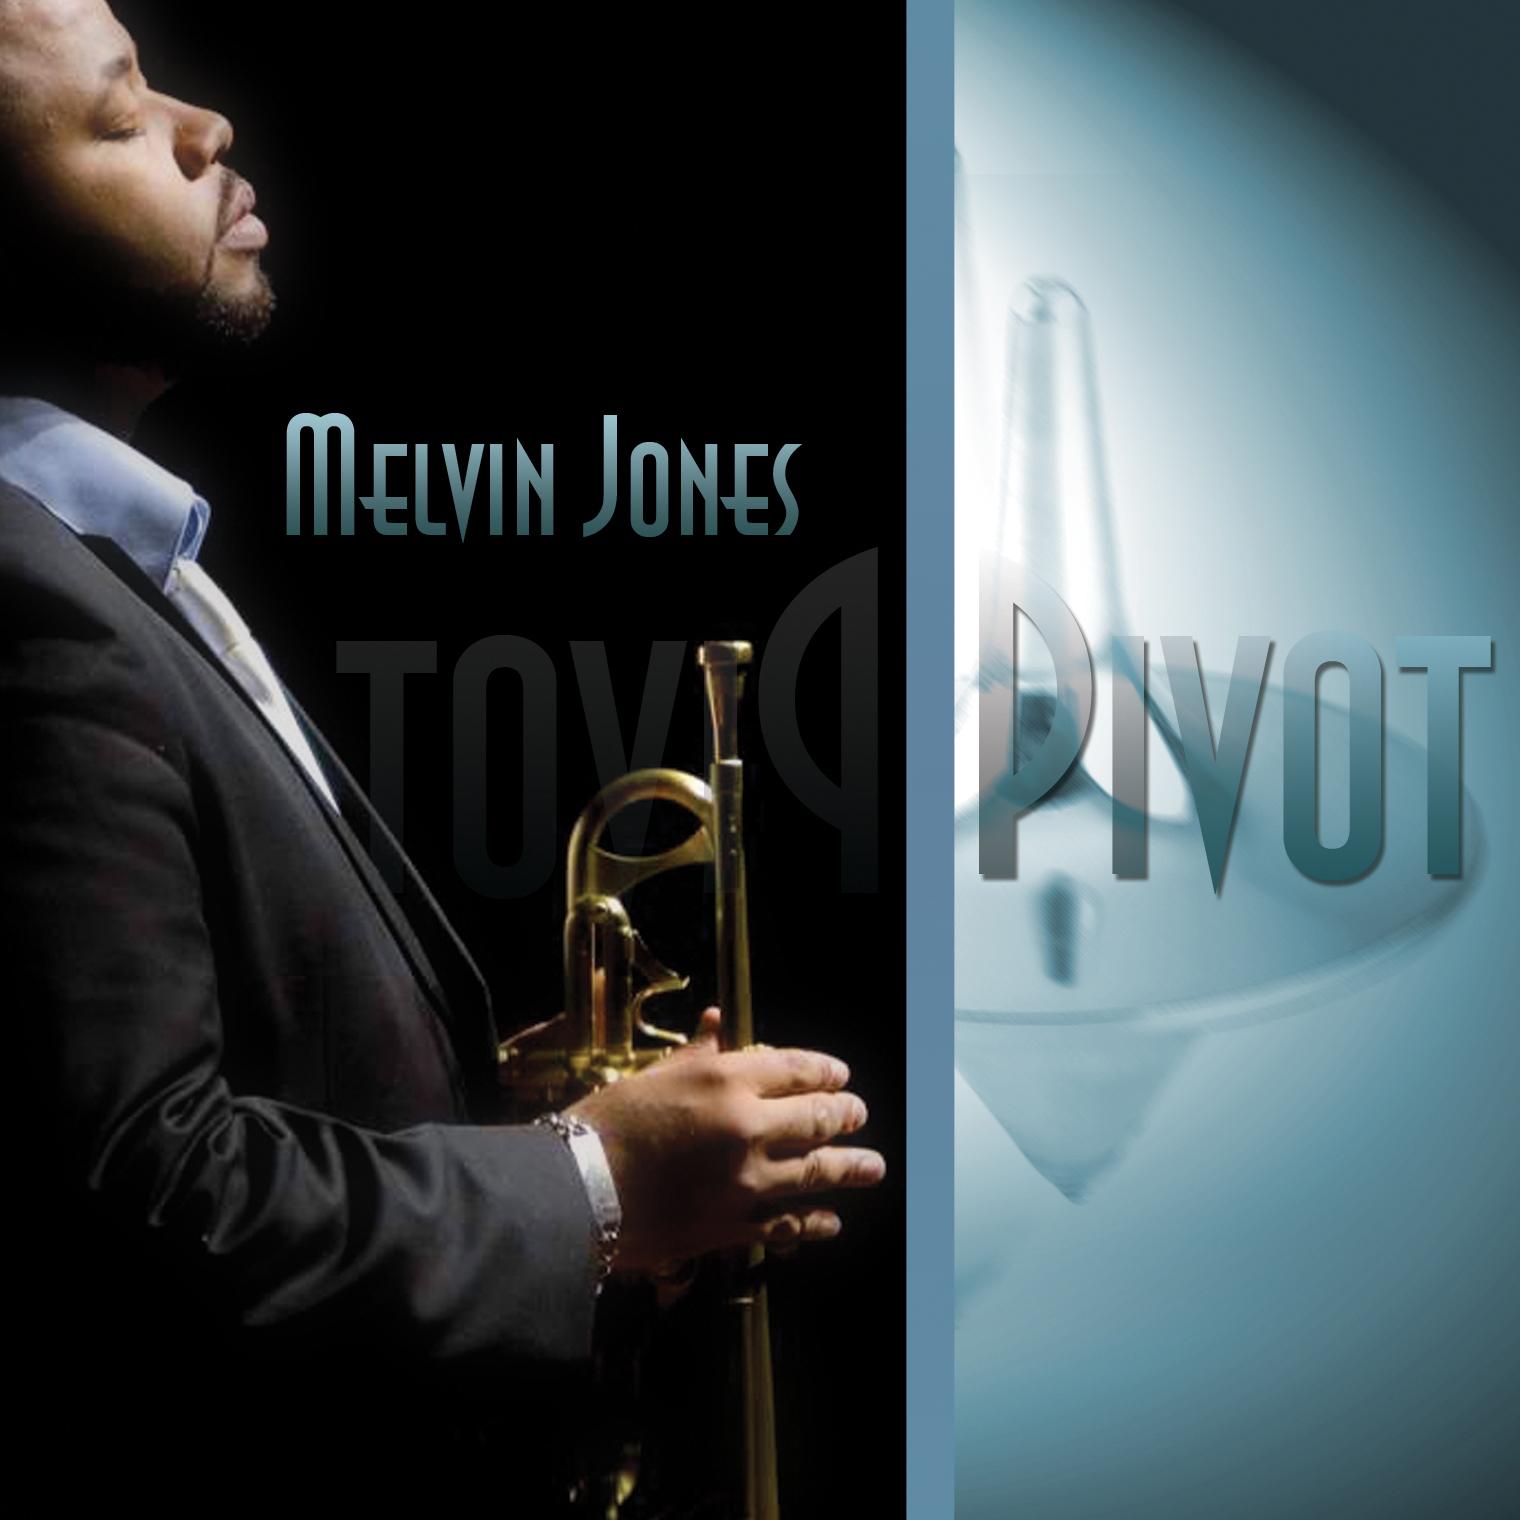 Melvin Jones - Pivot